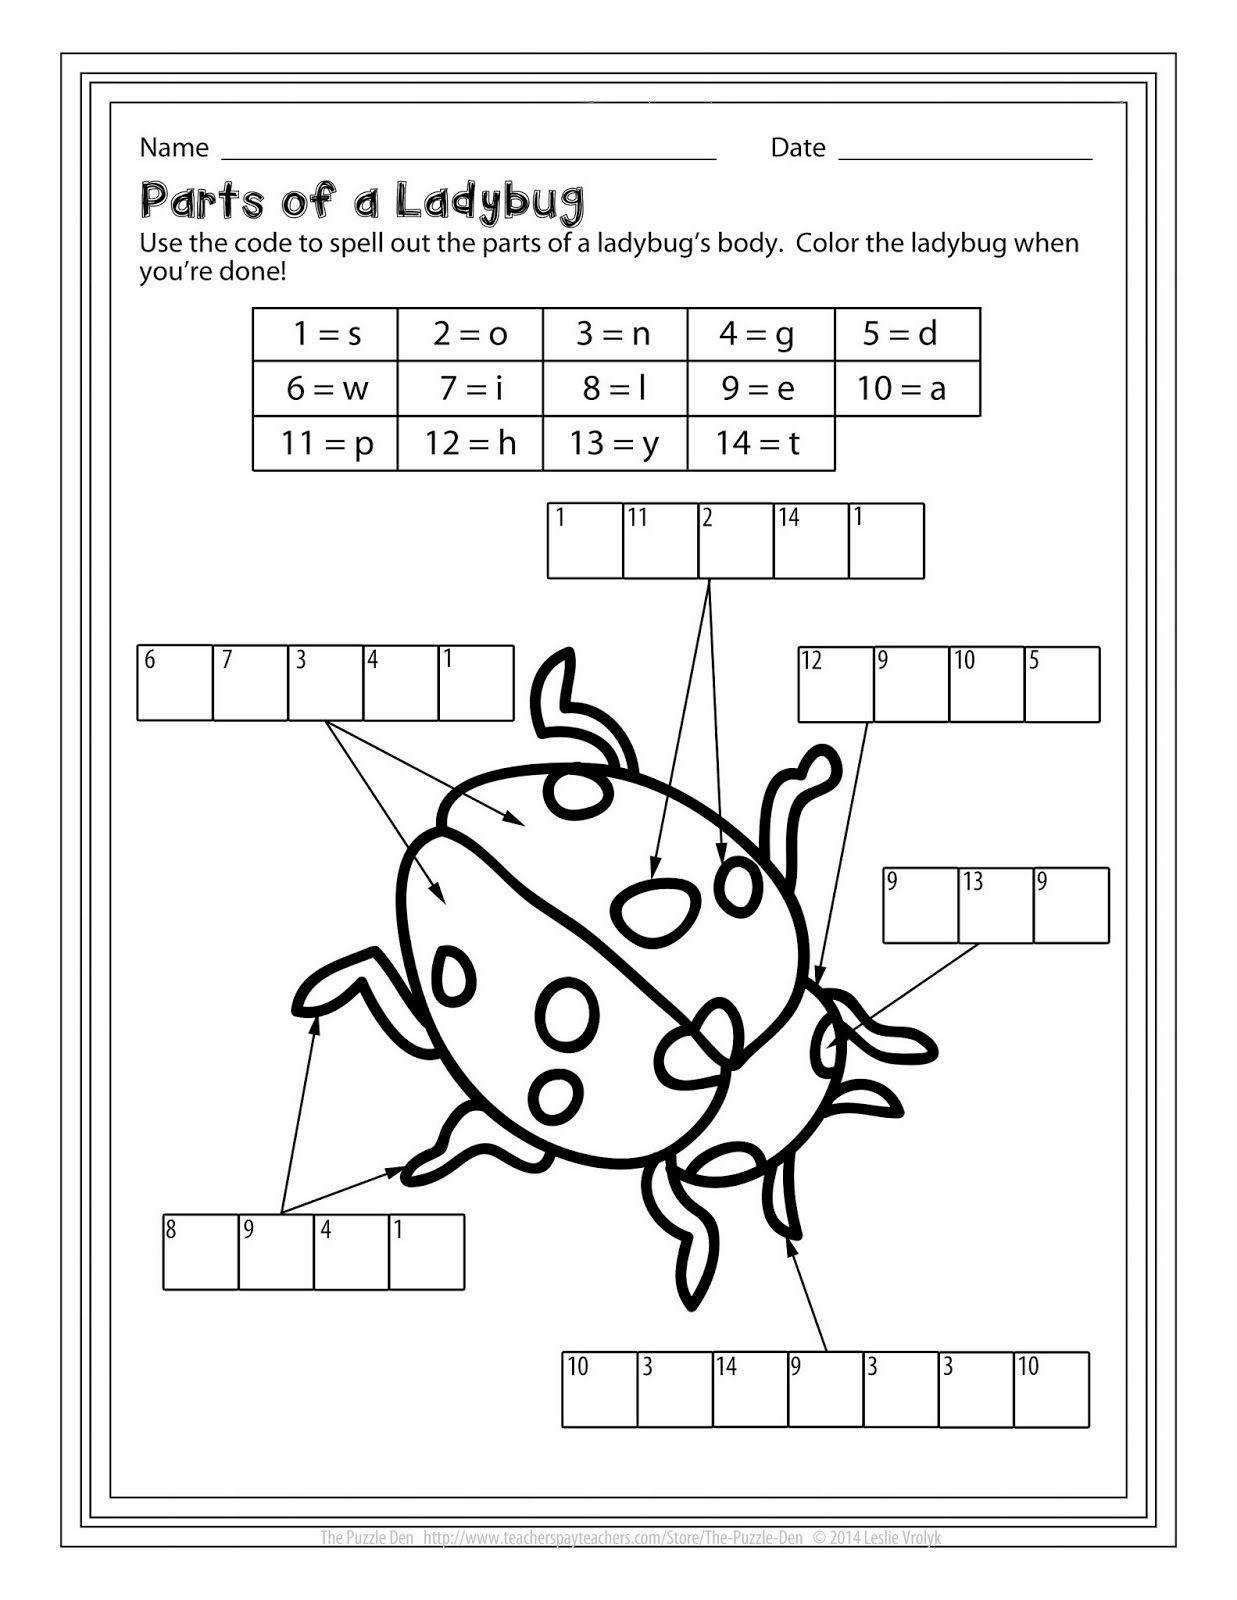 Perplexing Puzzles 1 23 14 The Puzzle Den